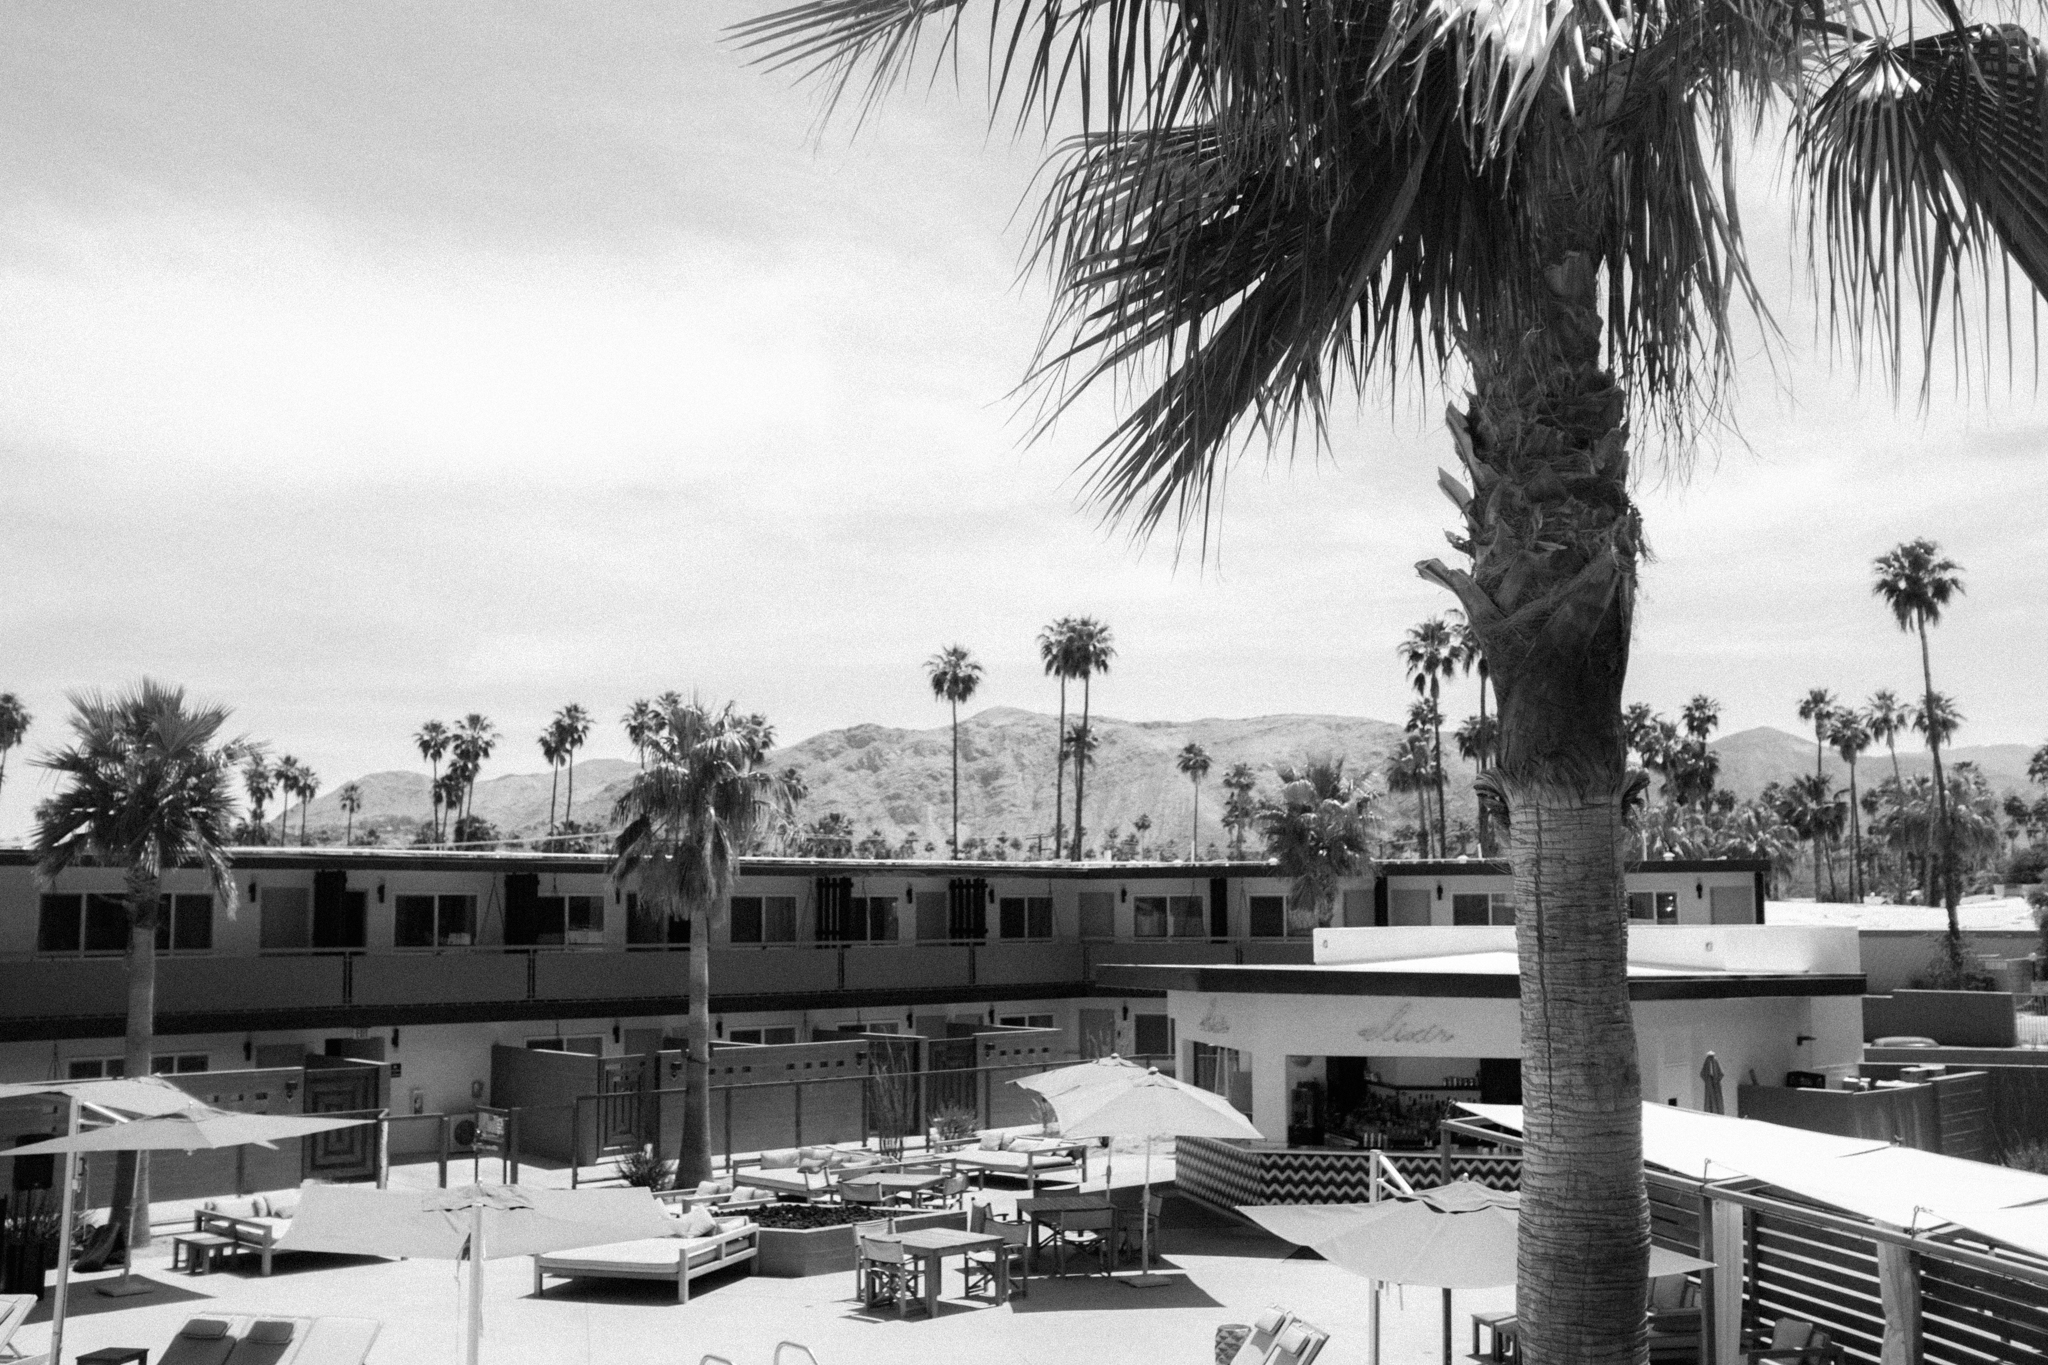 170422 Coachella 17 w2 1623.jpg